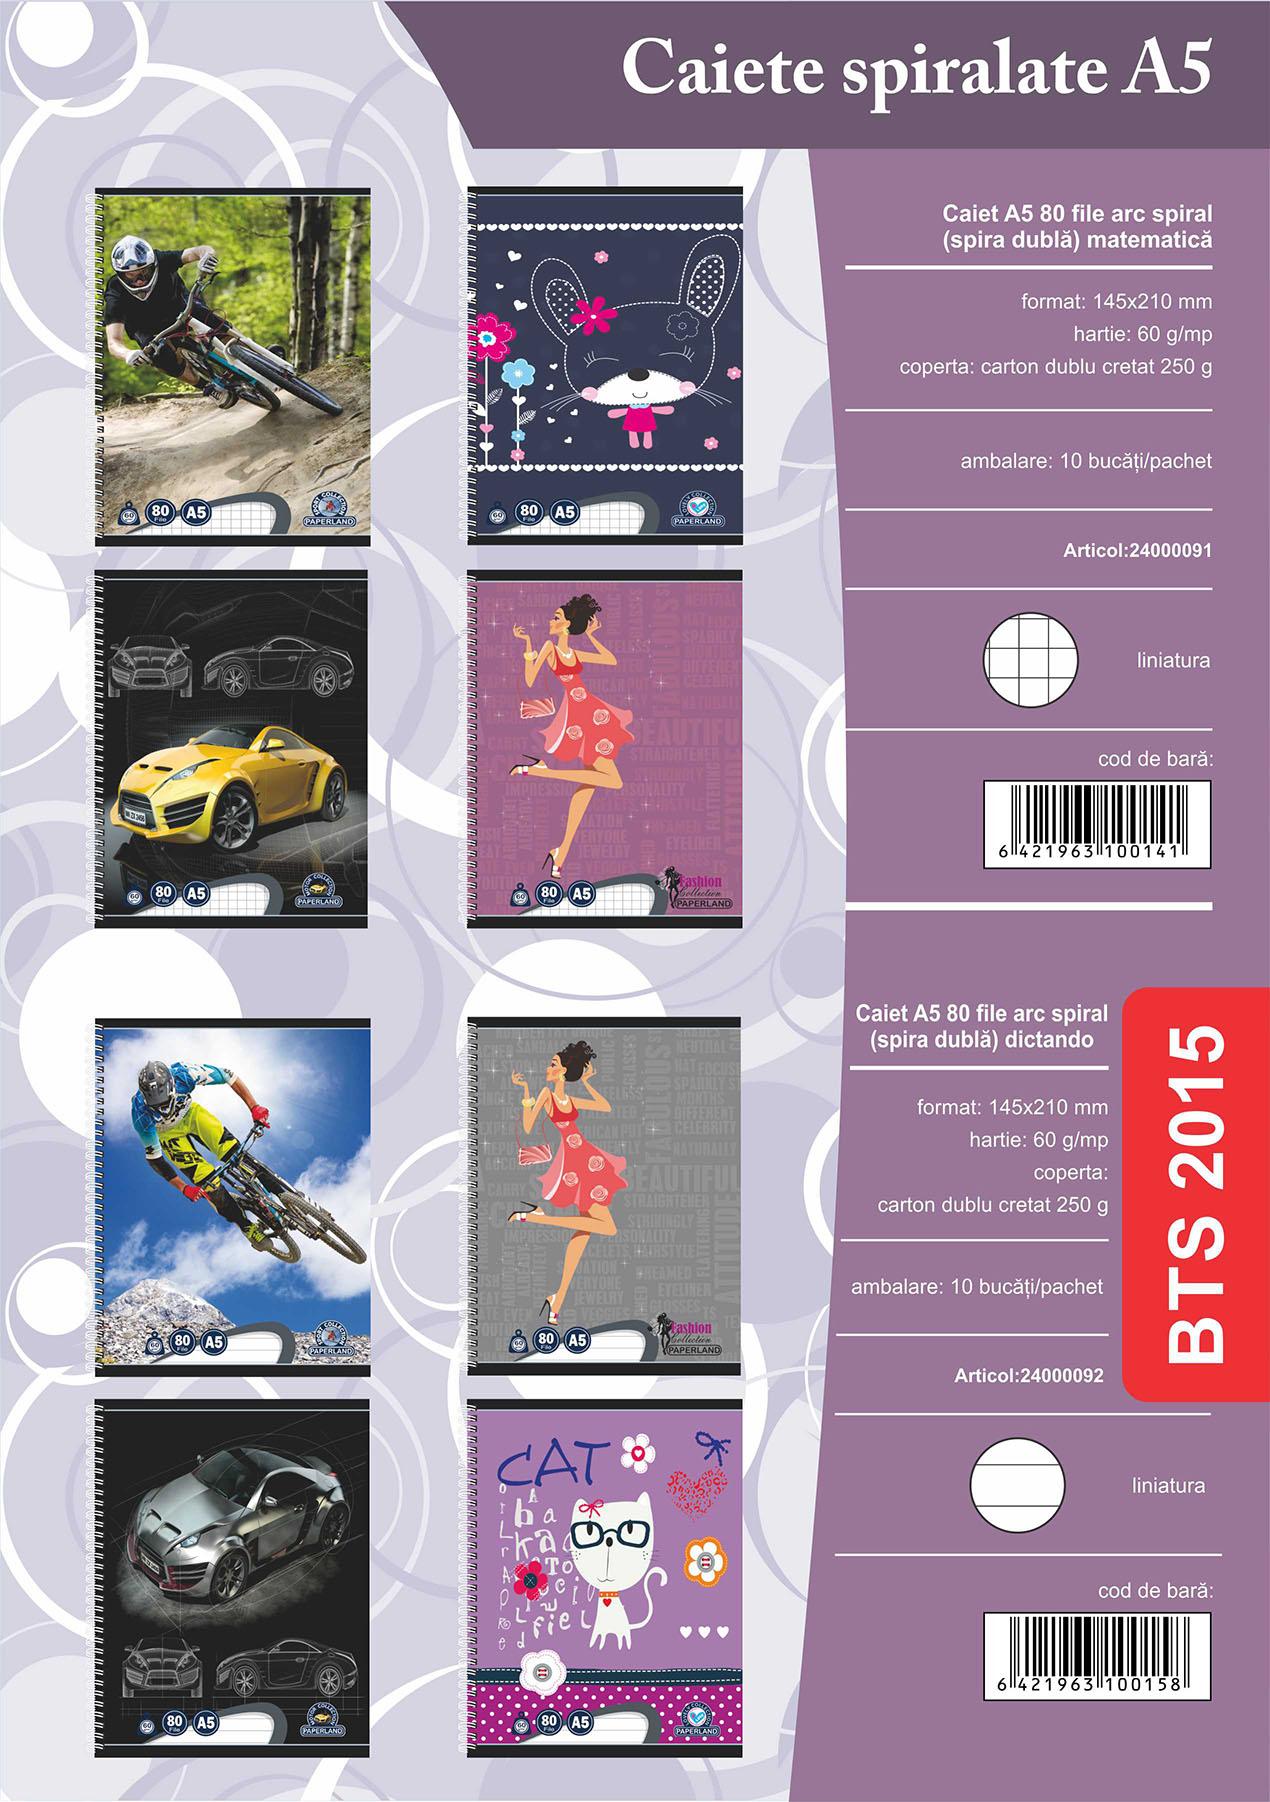 Caiet A5 80 file ARC (spira dubla) Image